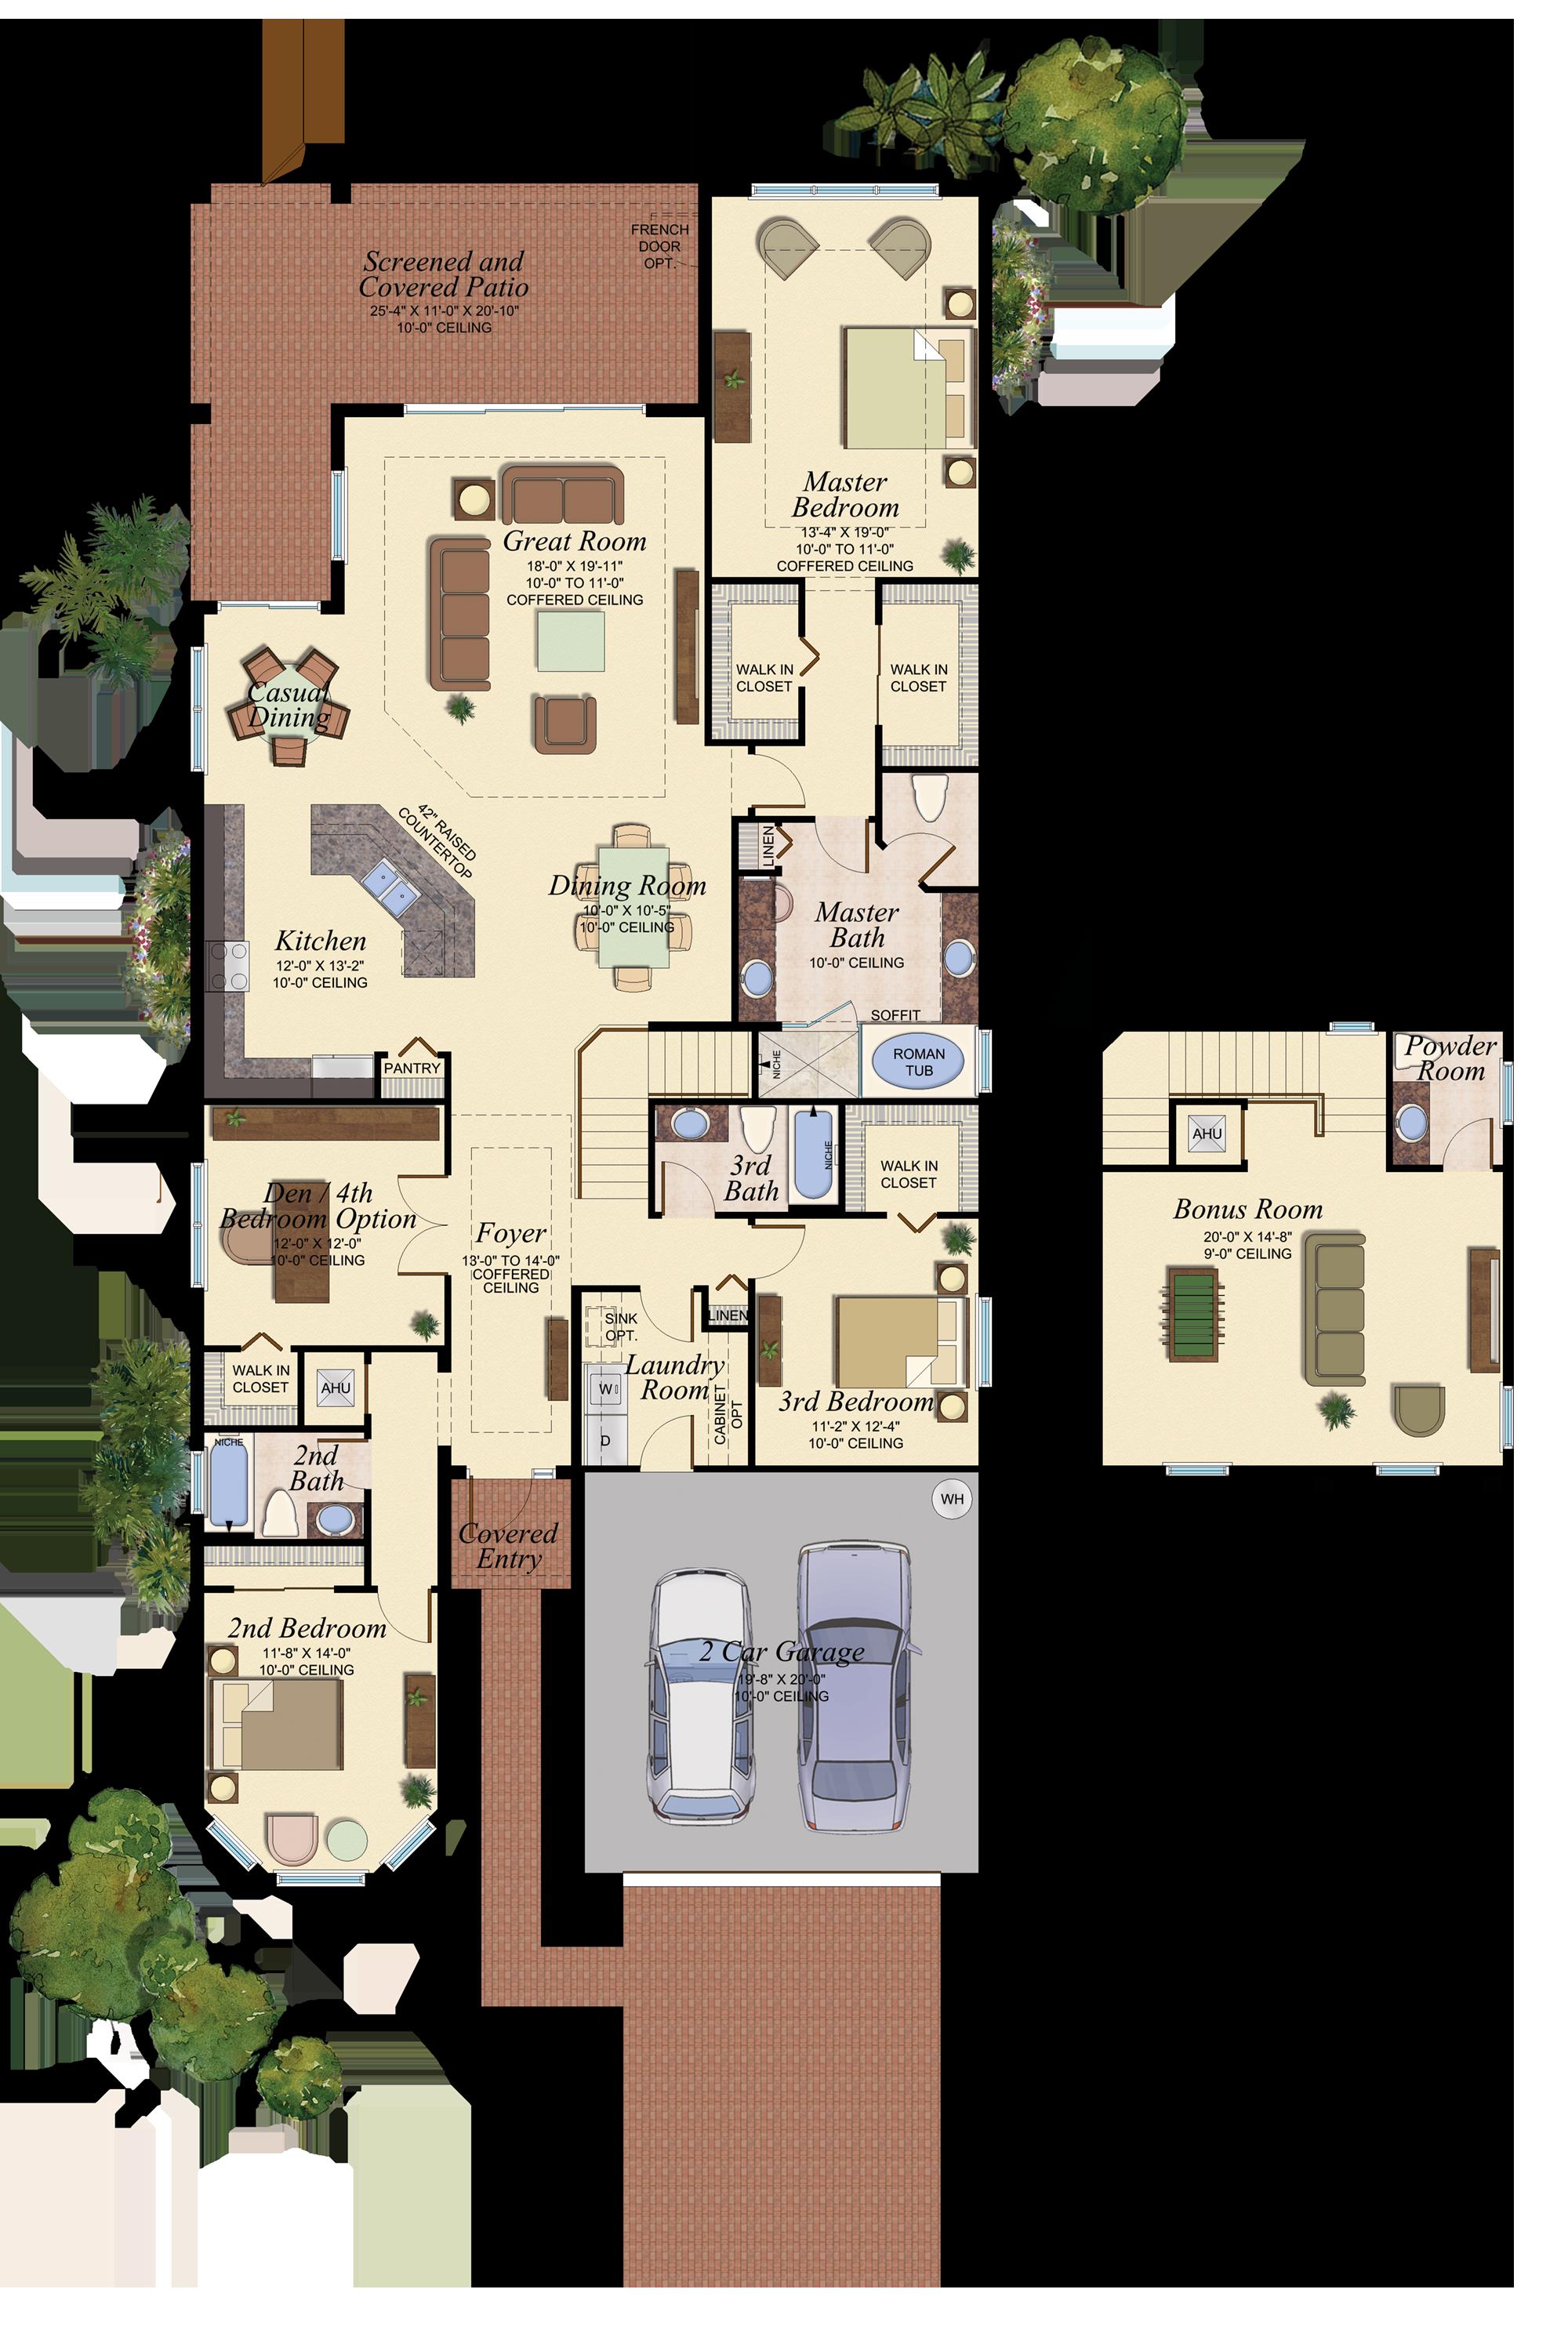 GL Homes | Modern House Design | House plans, House design ... on townhouse plans florida, kitchen cabinets florida, cottage plans florida, open floor plans florida, swimming pool plans florida,